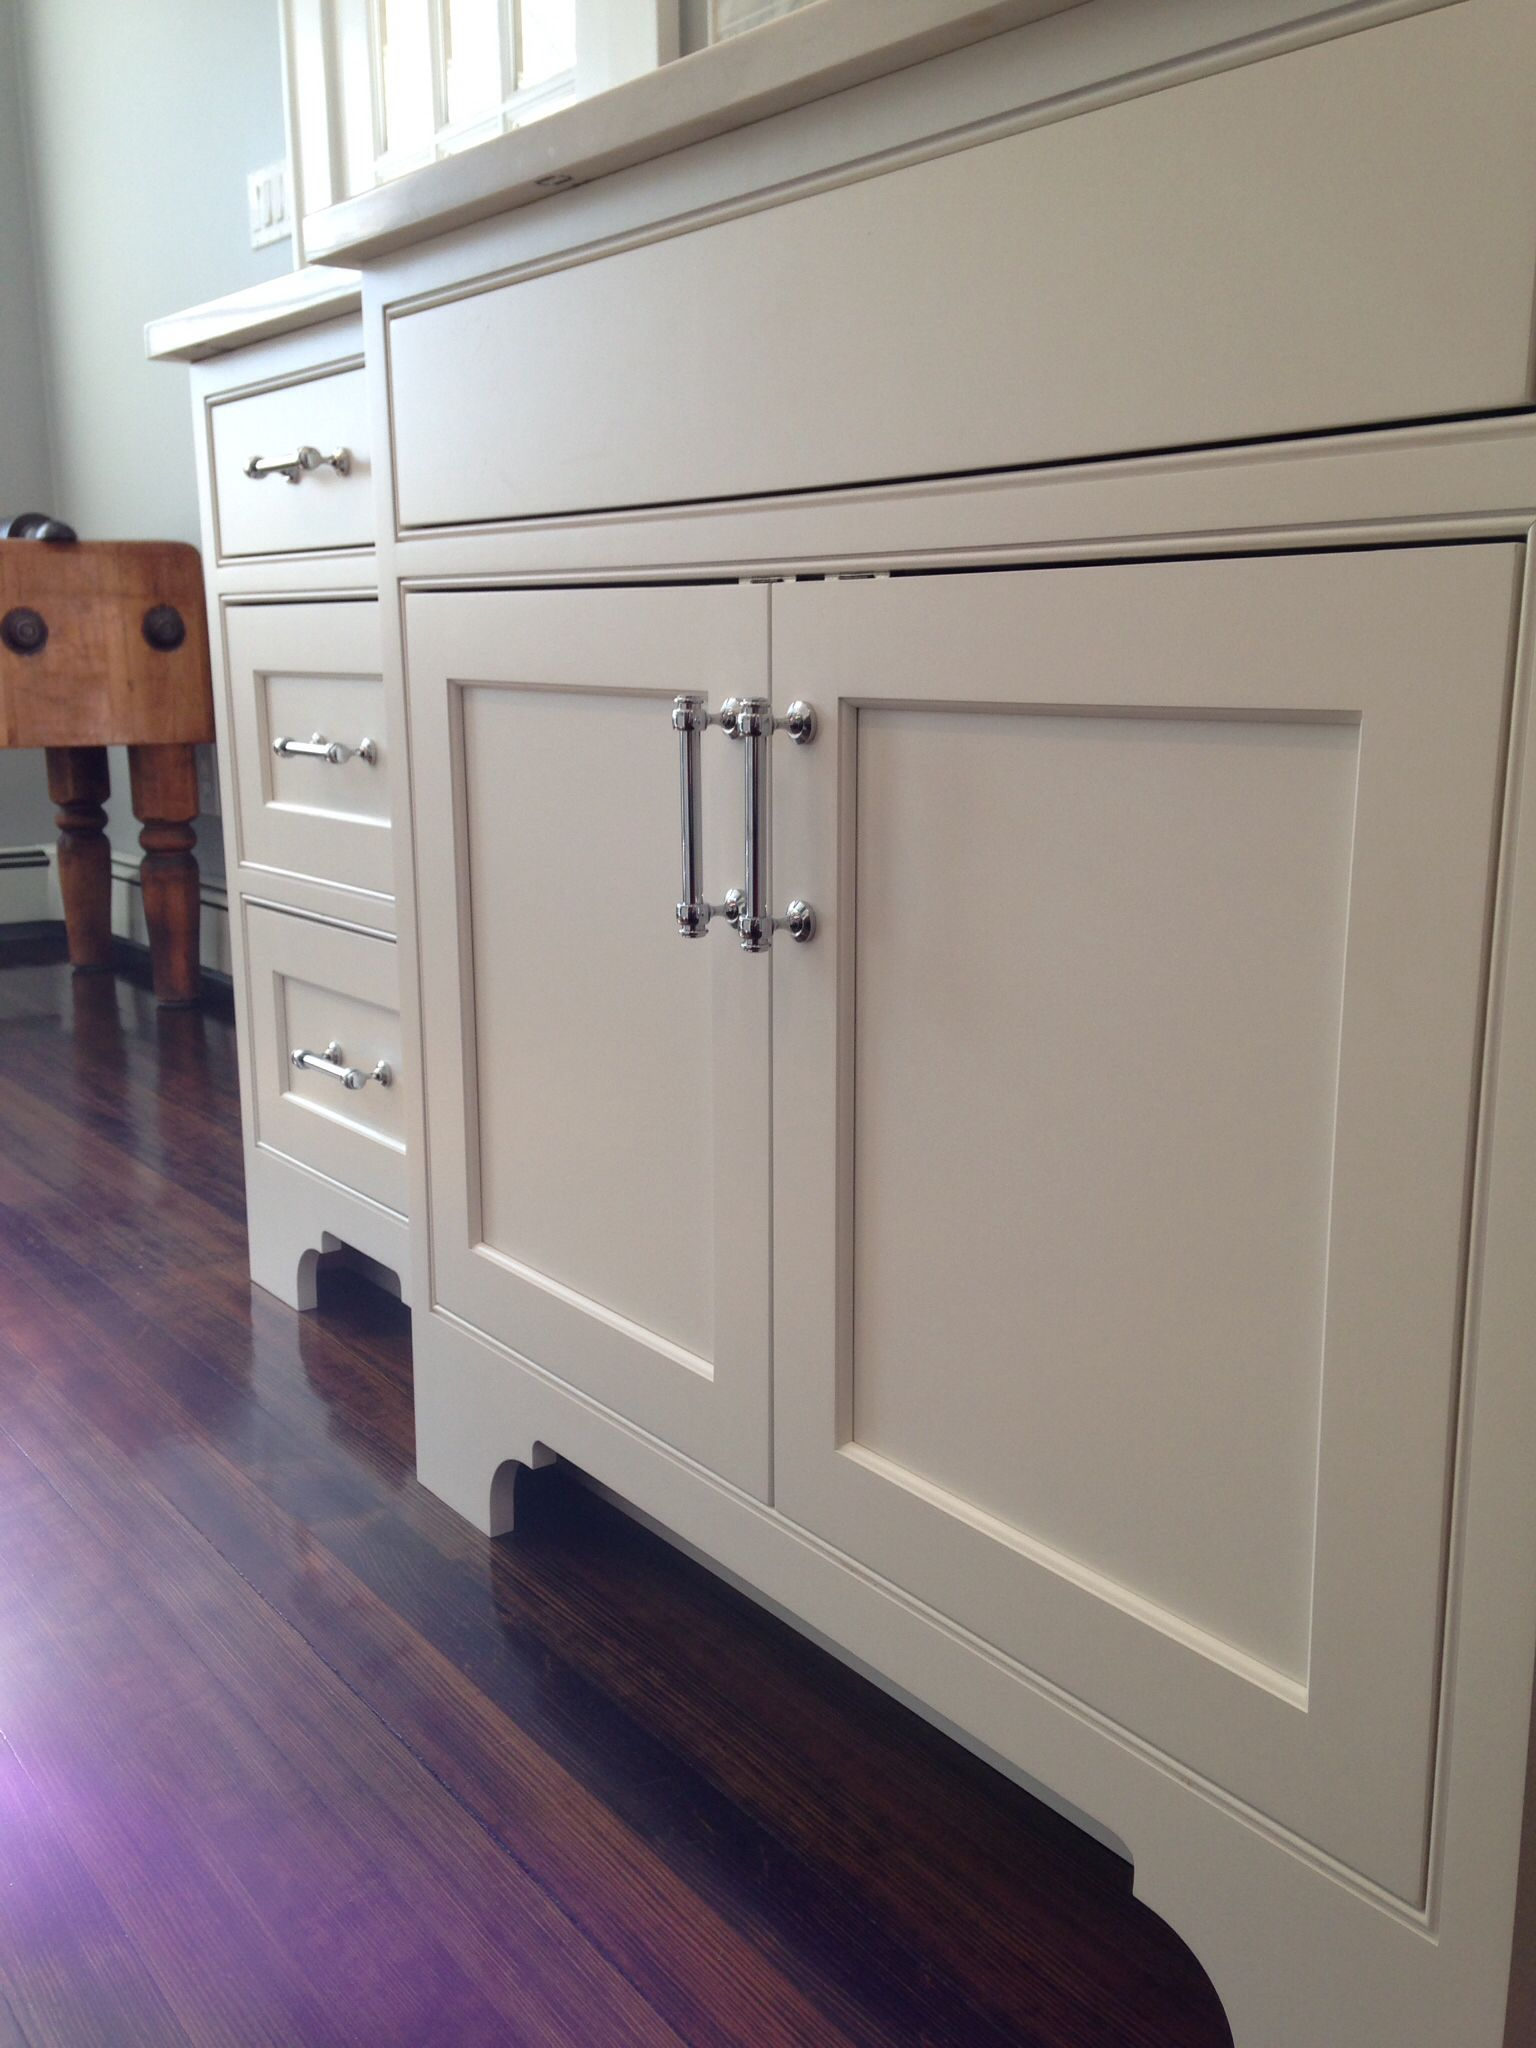 Restoration Hardware Look Alike Cabinet Pulls  Cabinets